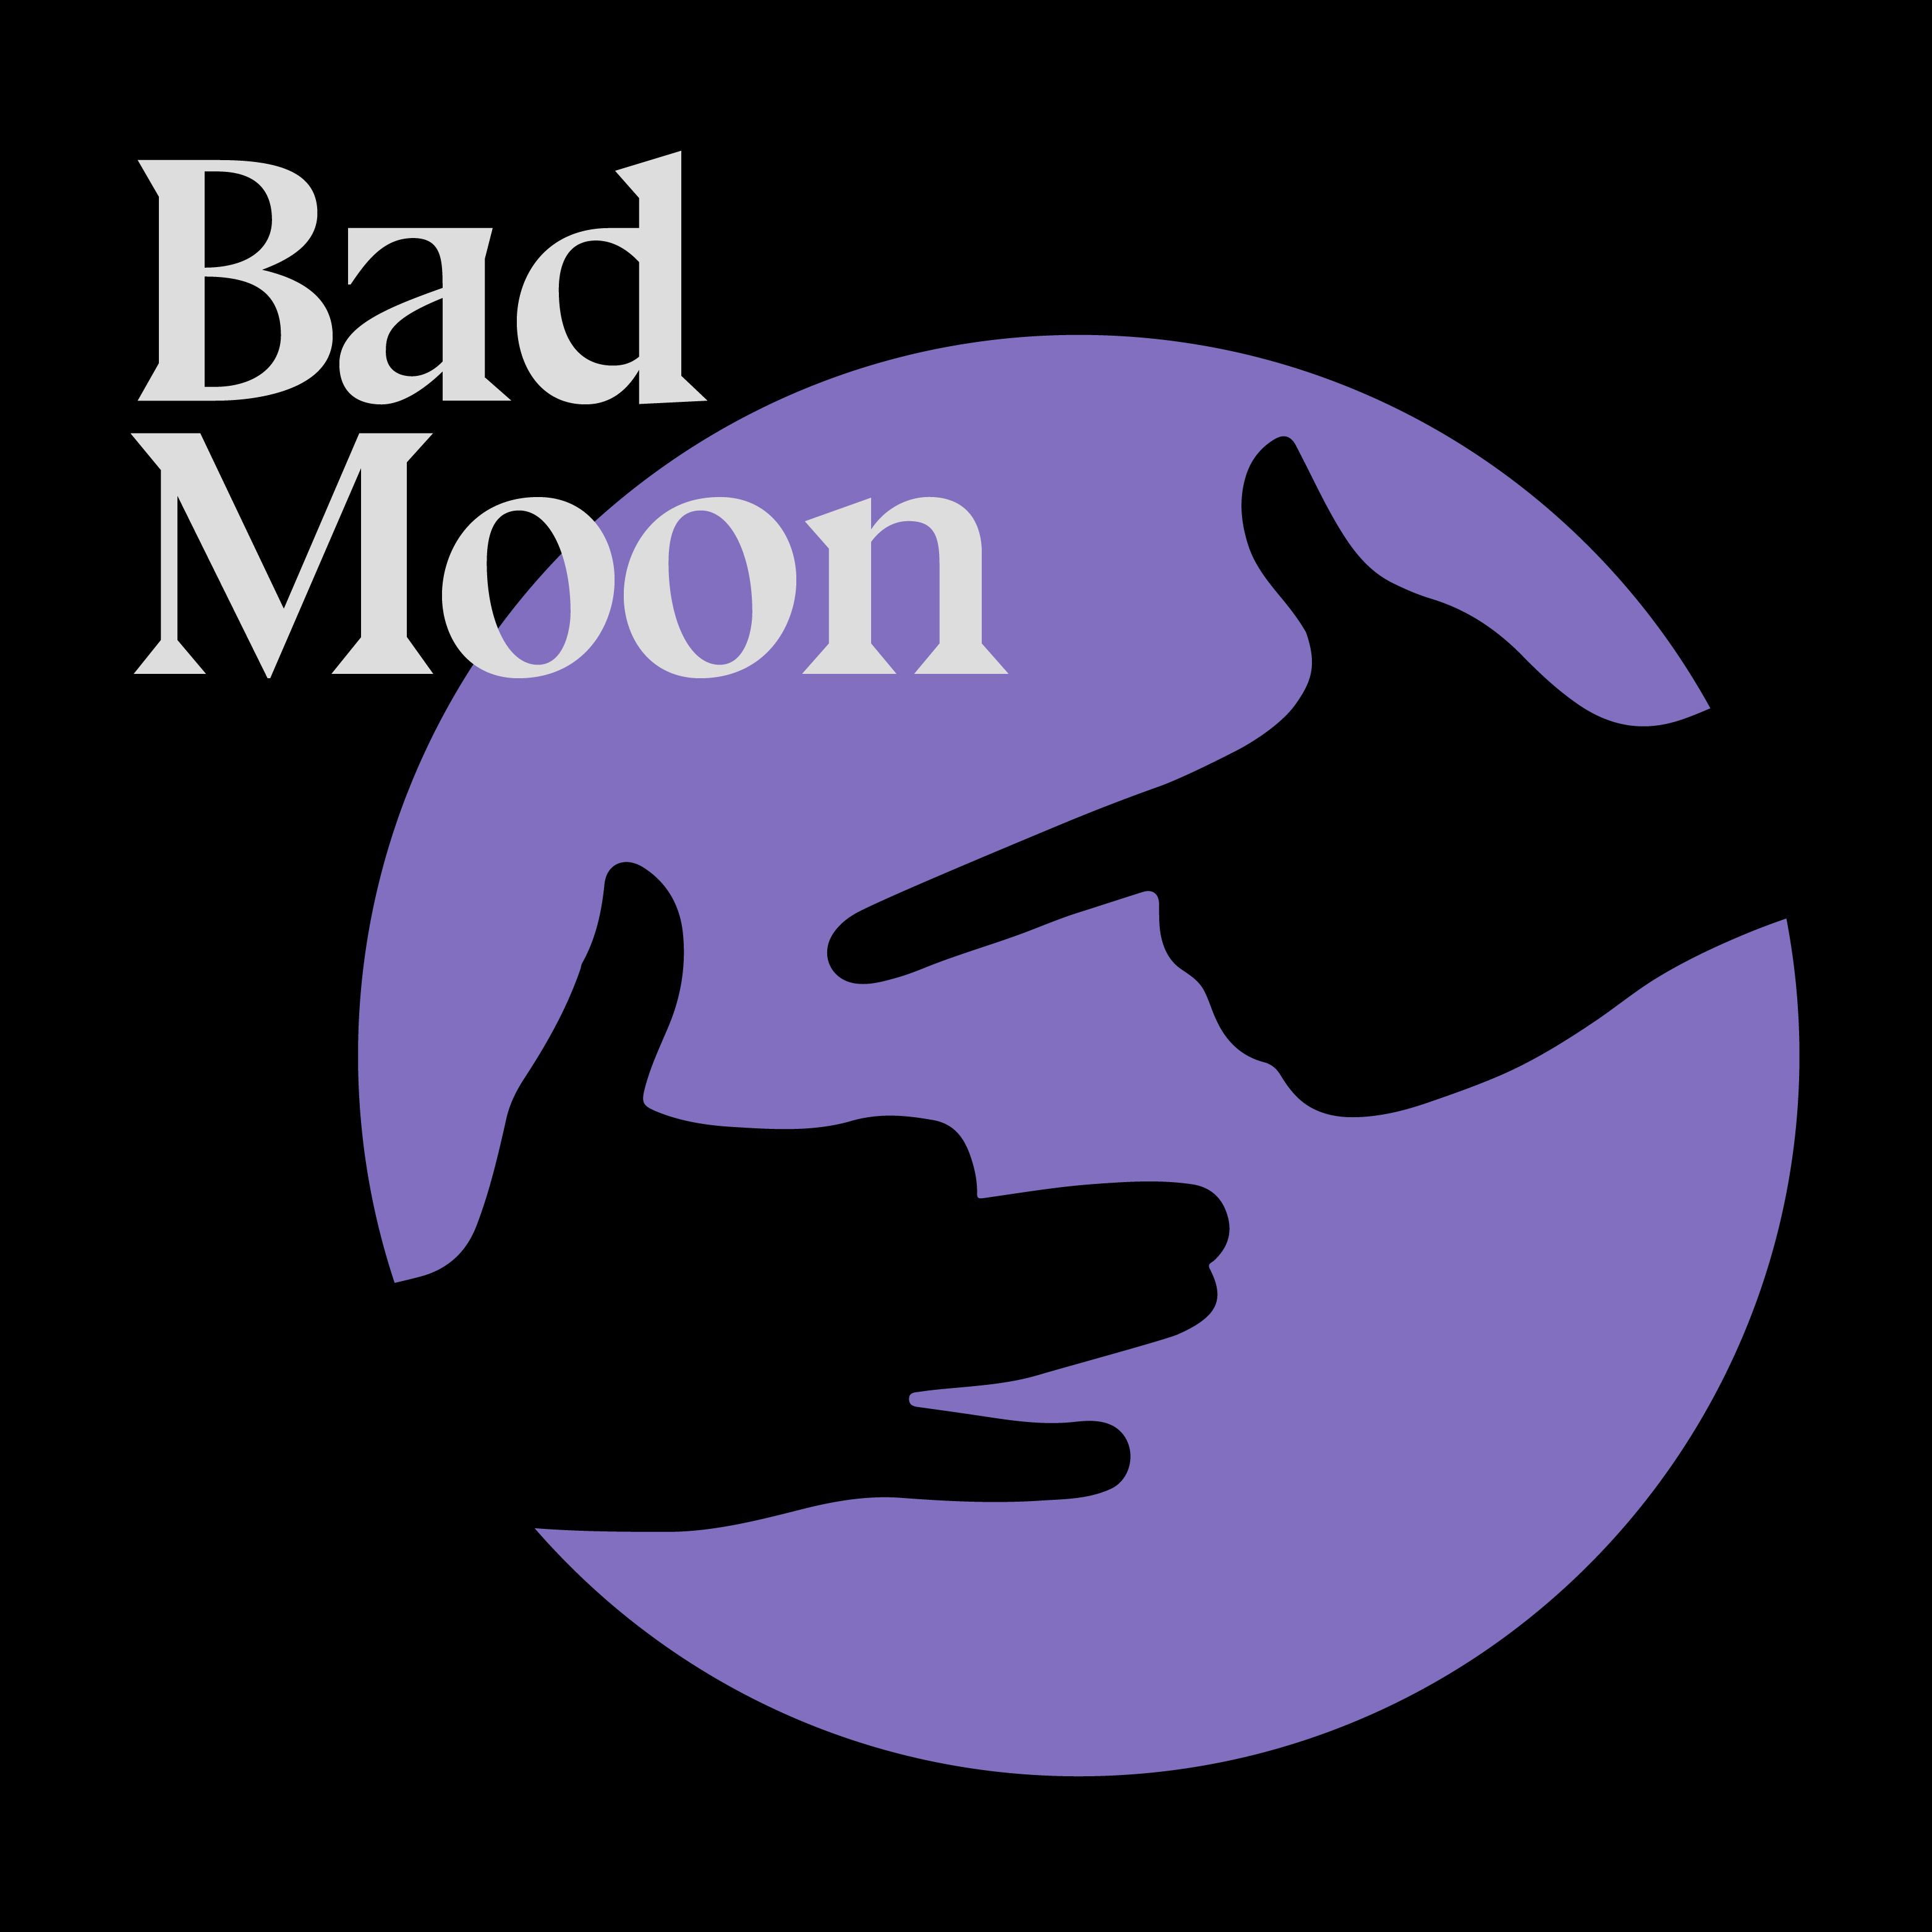 Bad Moon 坏月亮